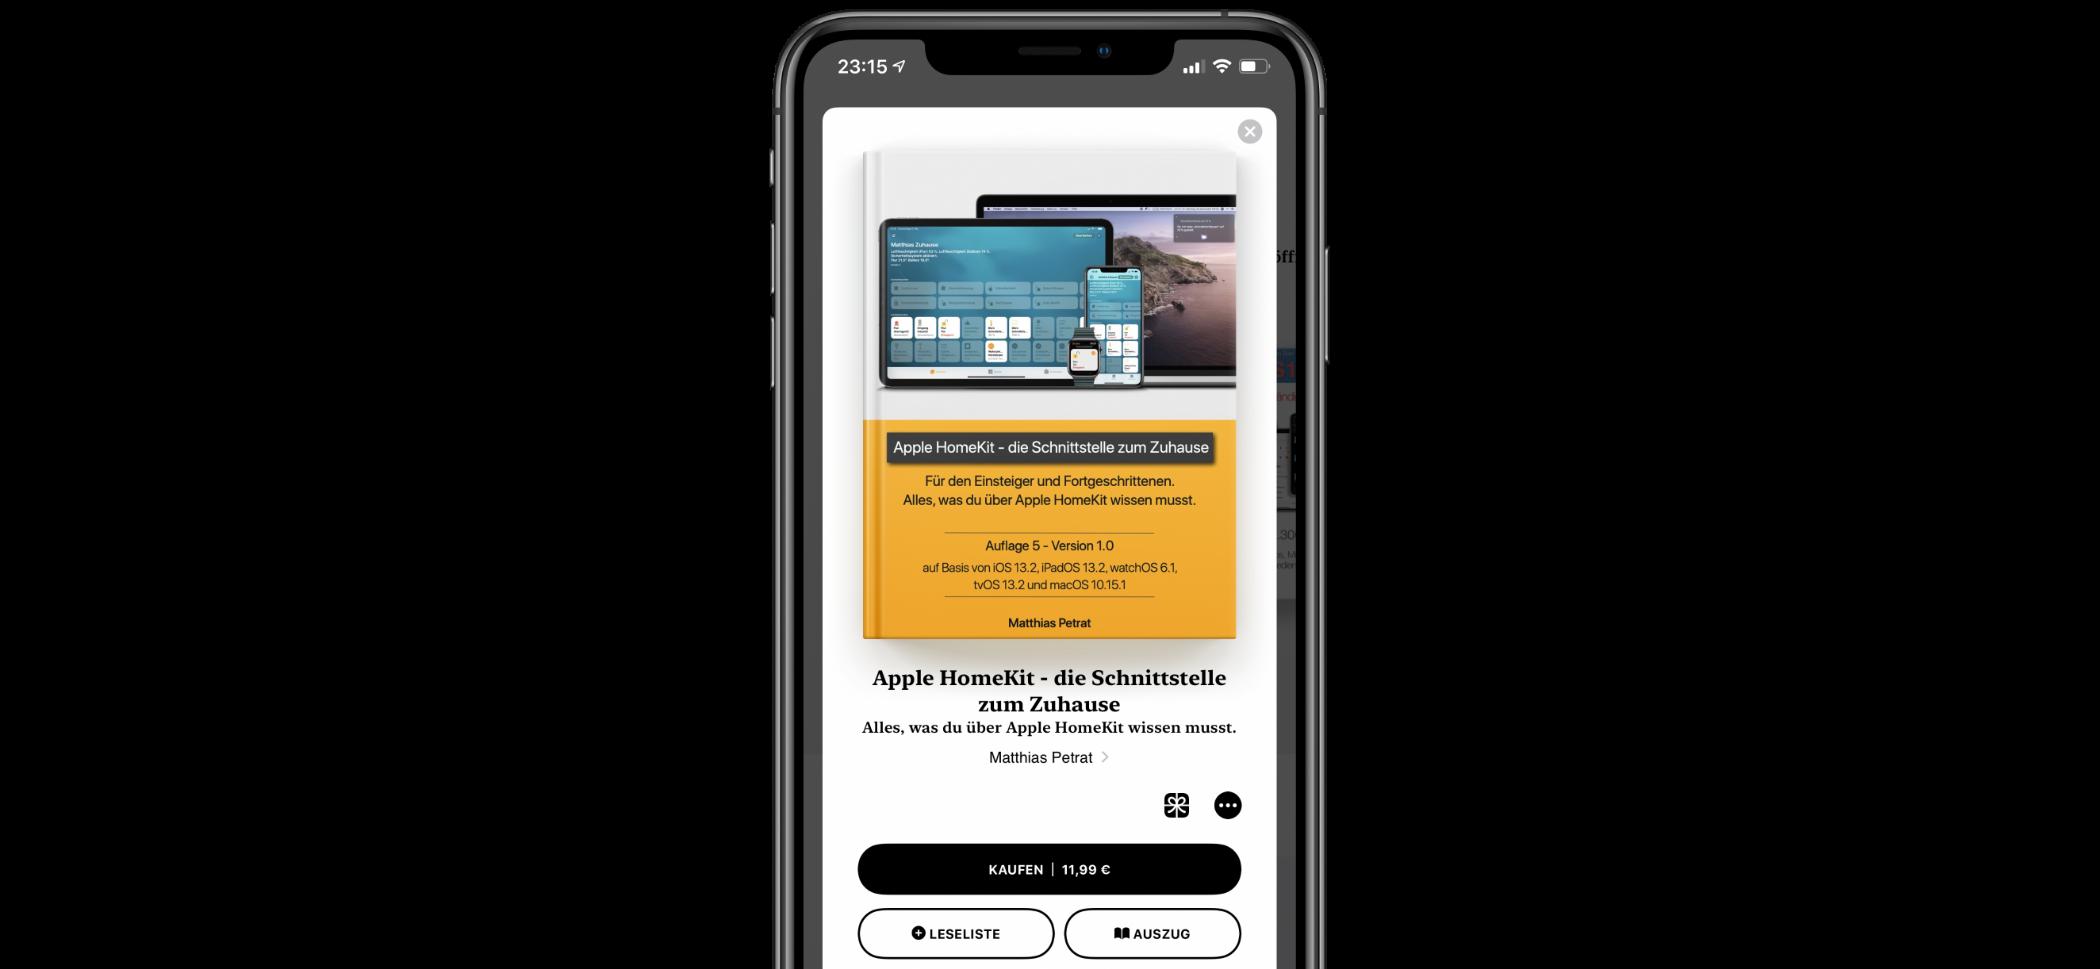 "iPhone-Screenshot-Apple-HomeKit-die-Schnittstelle-zum-Zuhause-Buchauflage-5 ""Apple HomeKit - die Schnittstelle zum Zuhause"": Die 5. Buchauflage ist da"